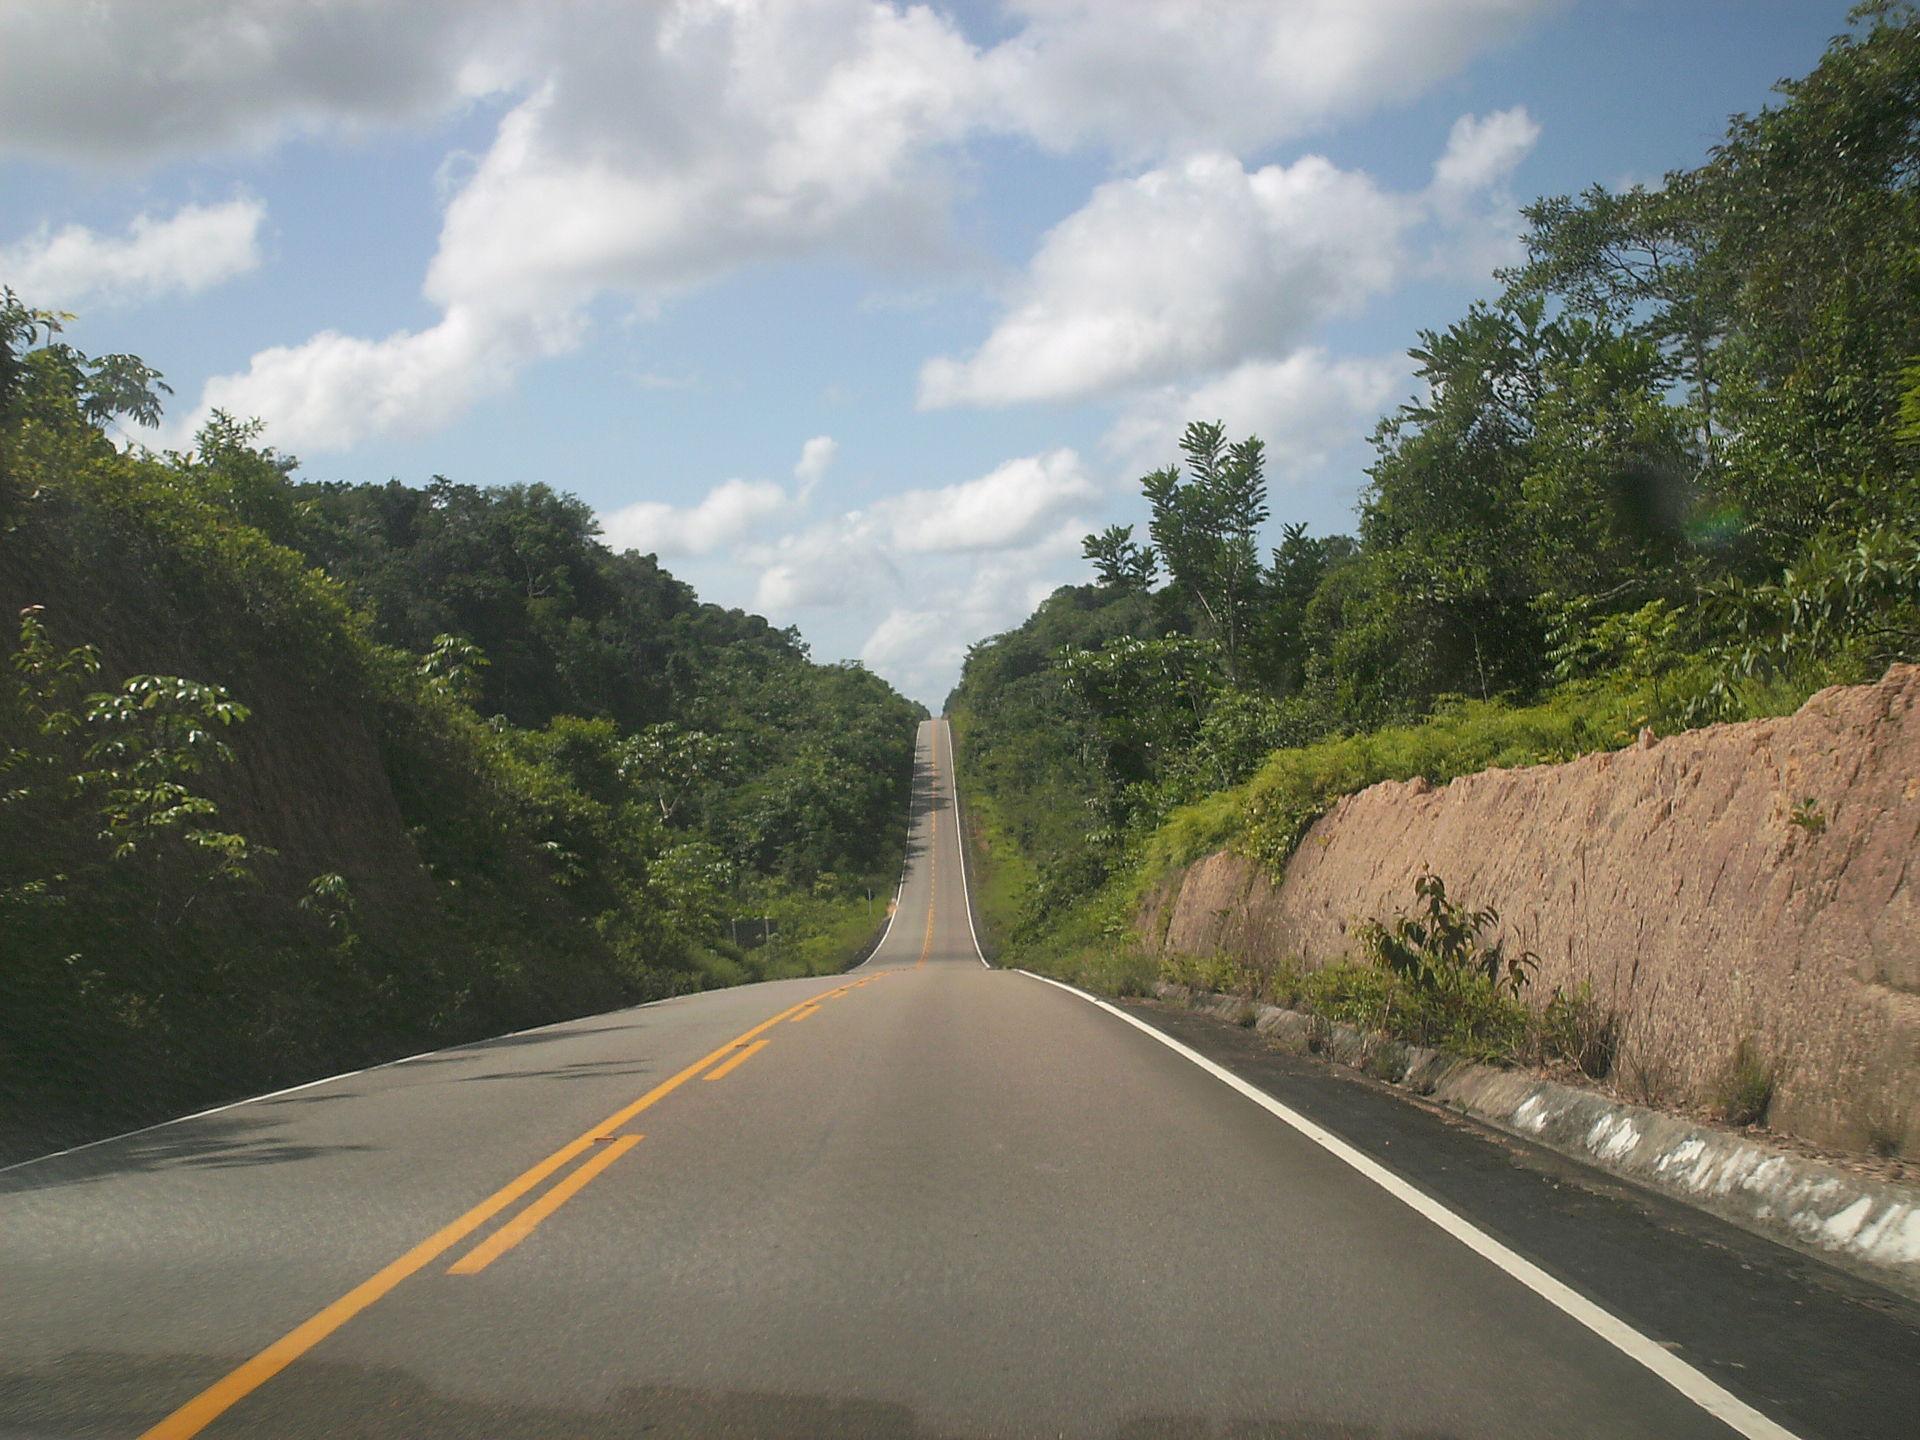 A road cuts through the Waimiri-Atroari Reserve in Roraima, Brazil. (Wikimedia Commons)